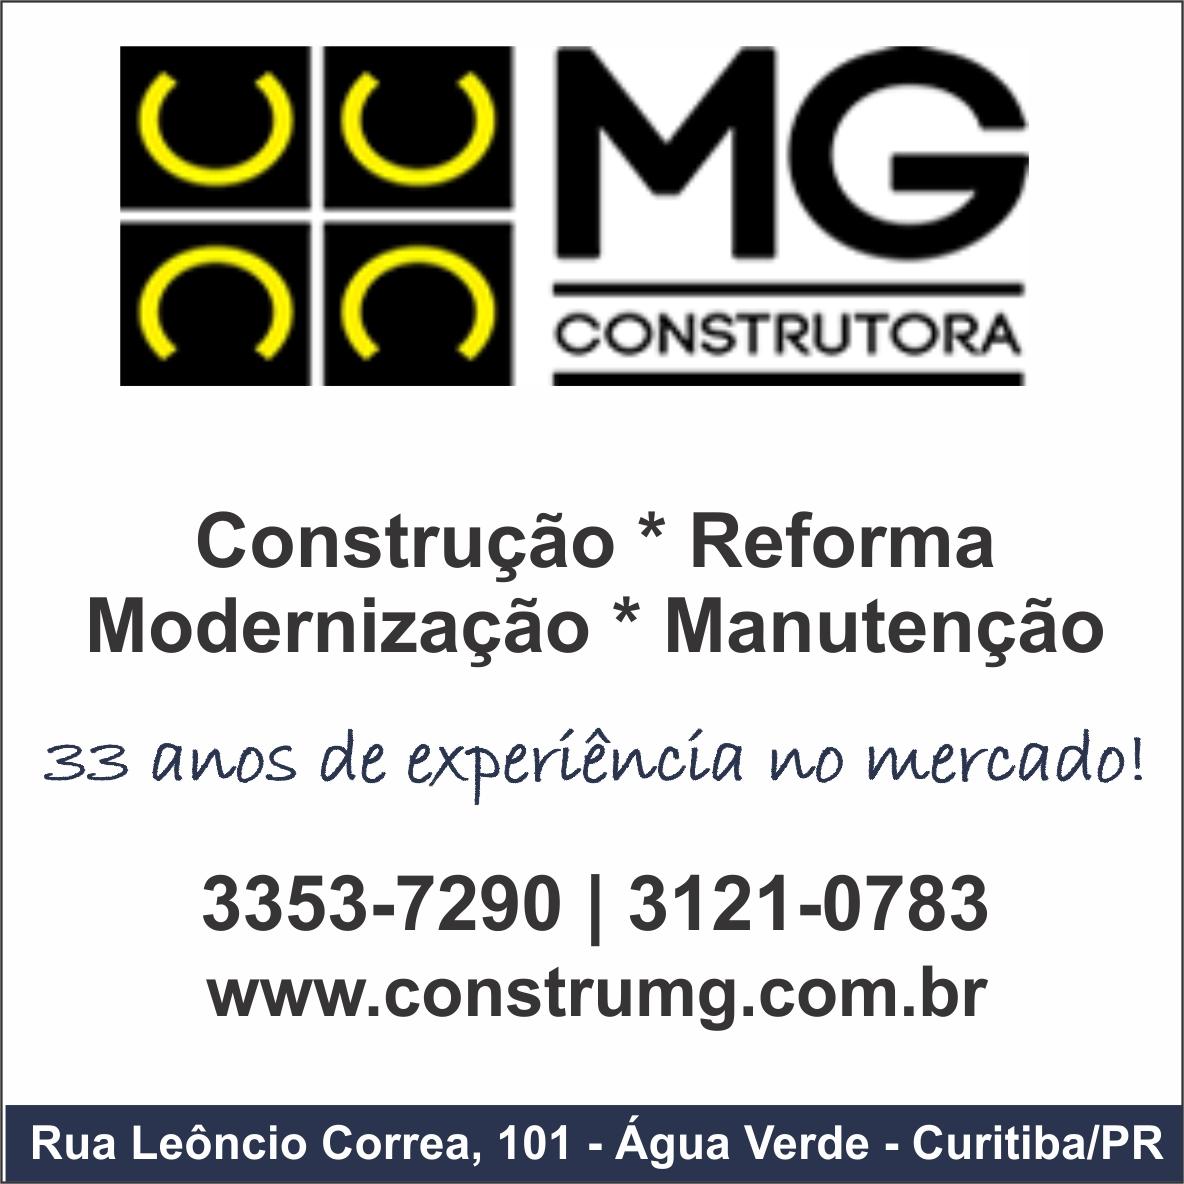 construtora mg